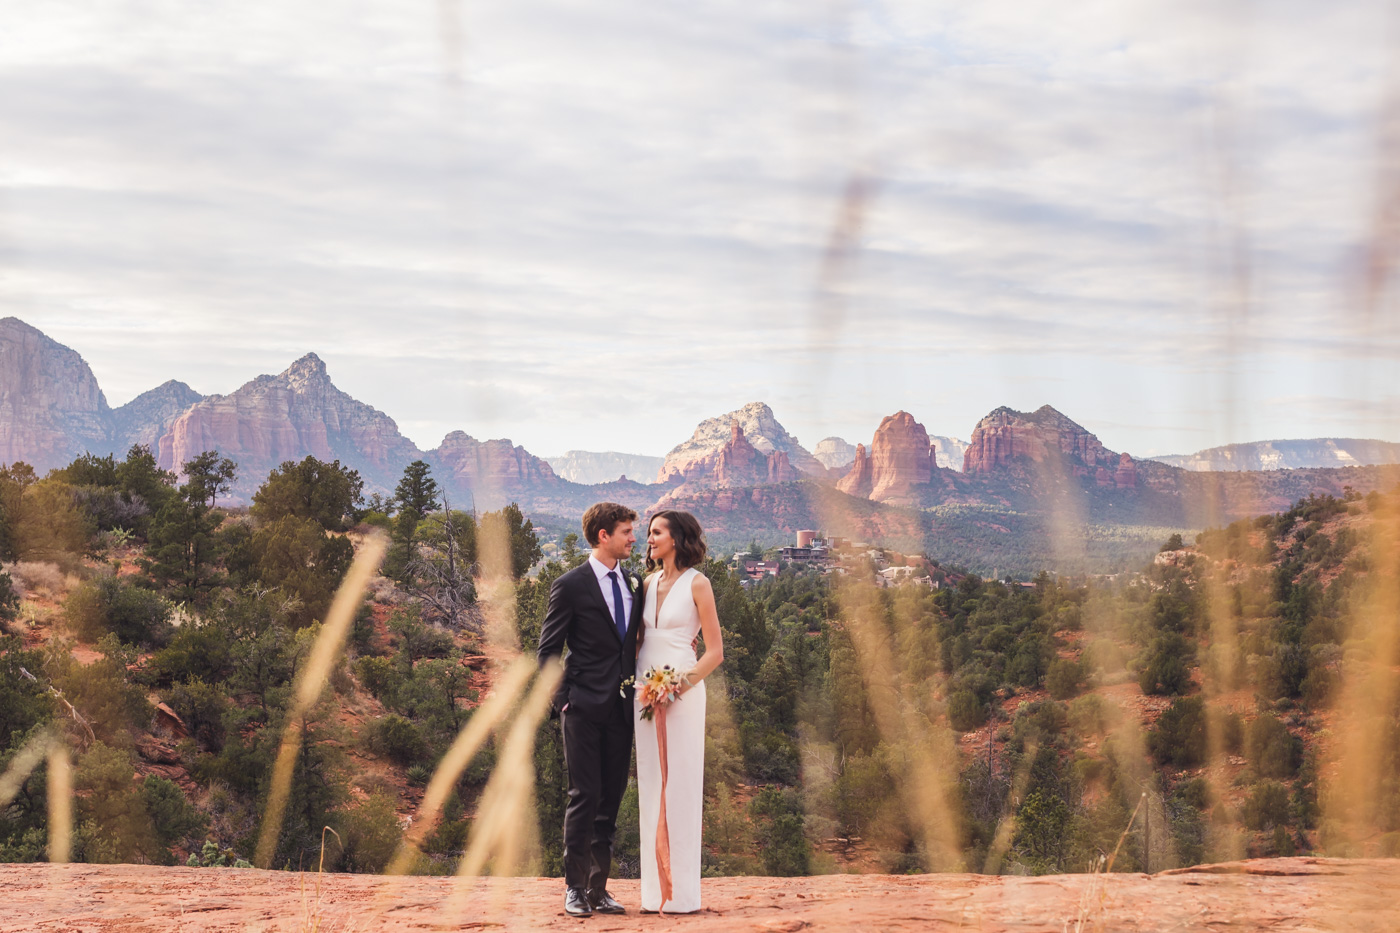 unique-pov-wedding-portrait